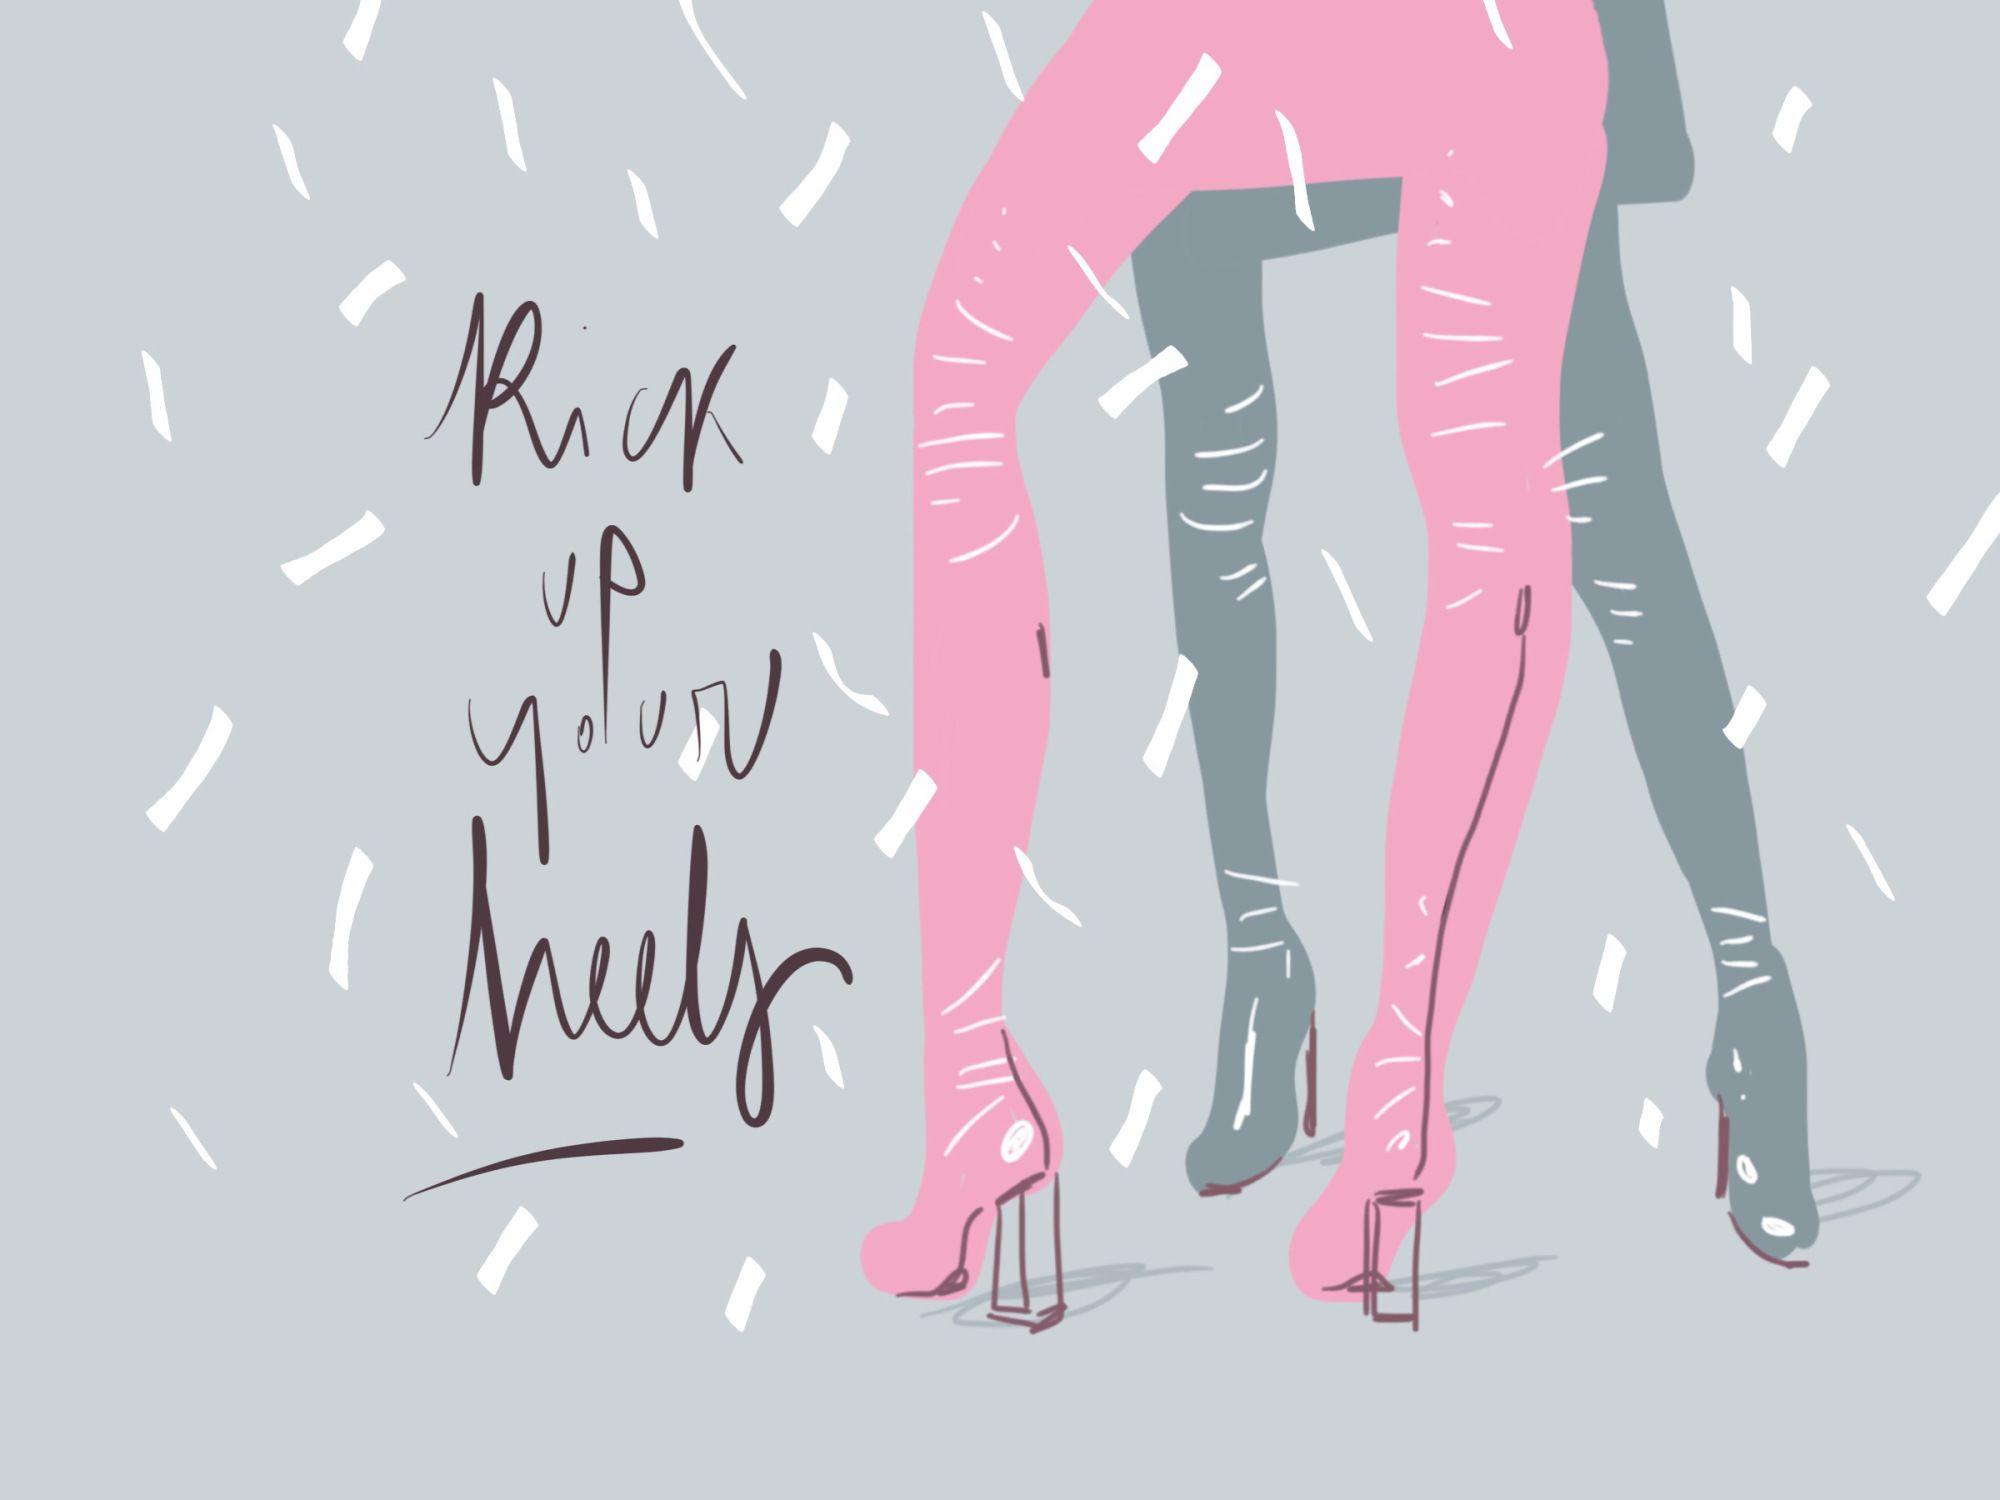 Kick up your heels - Happy New Year! #2017 - www.opentoeillustration.com